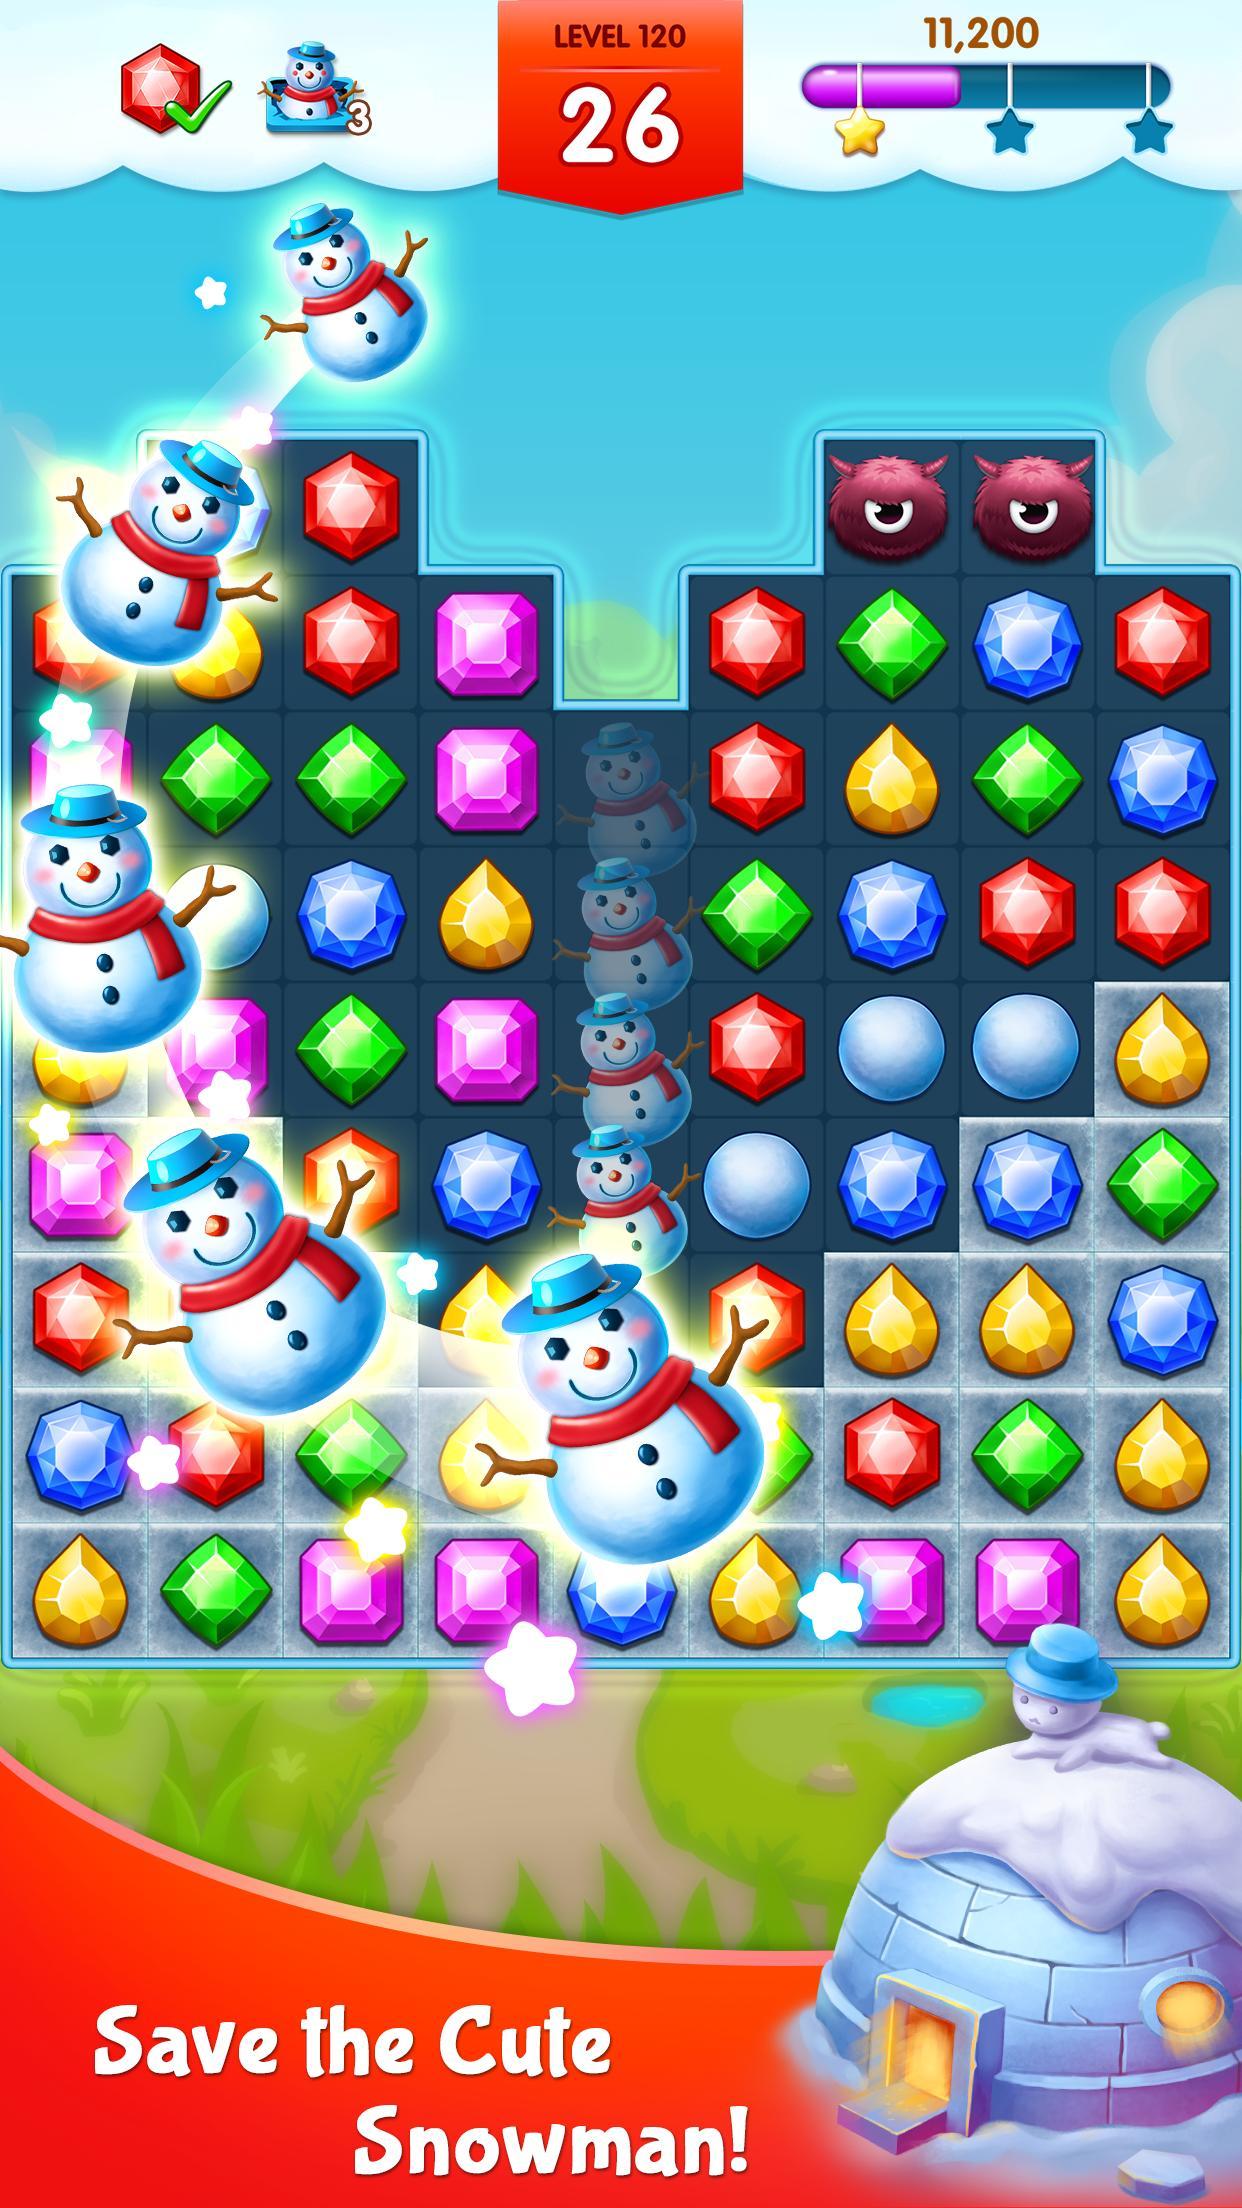 Jewels Legend - Match 3 Puzzle 2.33.3 Screenshot 10